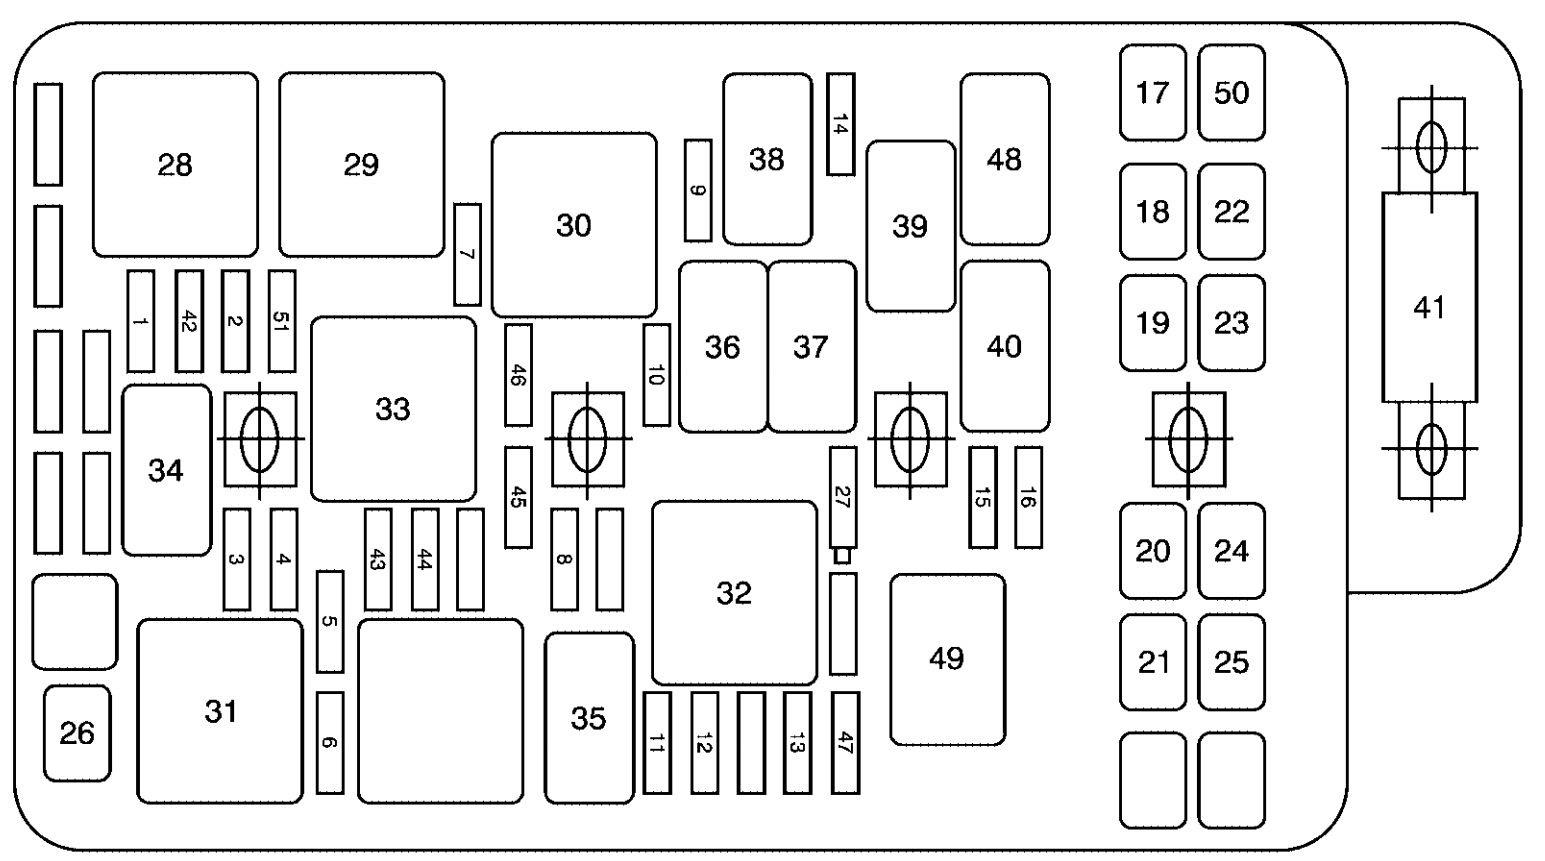 06 Pontiac G6 Fuse Box Location Wiring Diagram Page Fund Best Fund Best Granballodicomo It